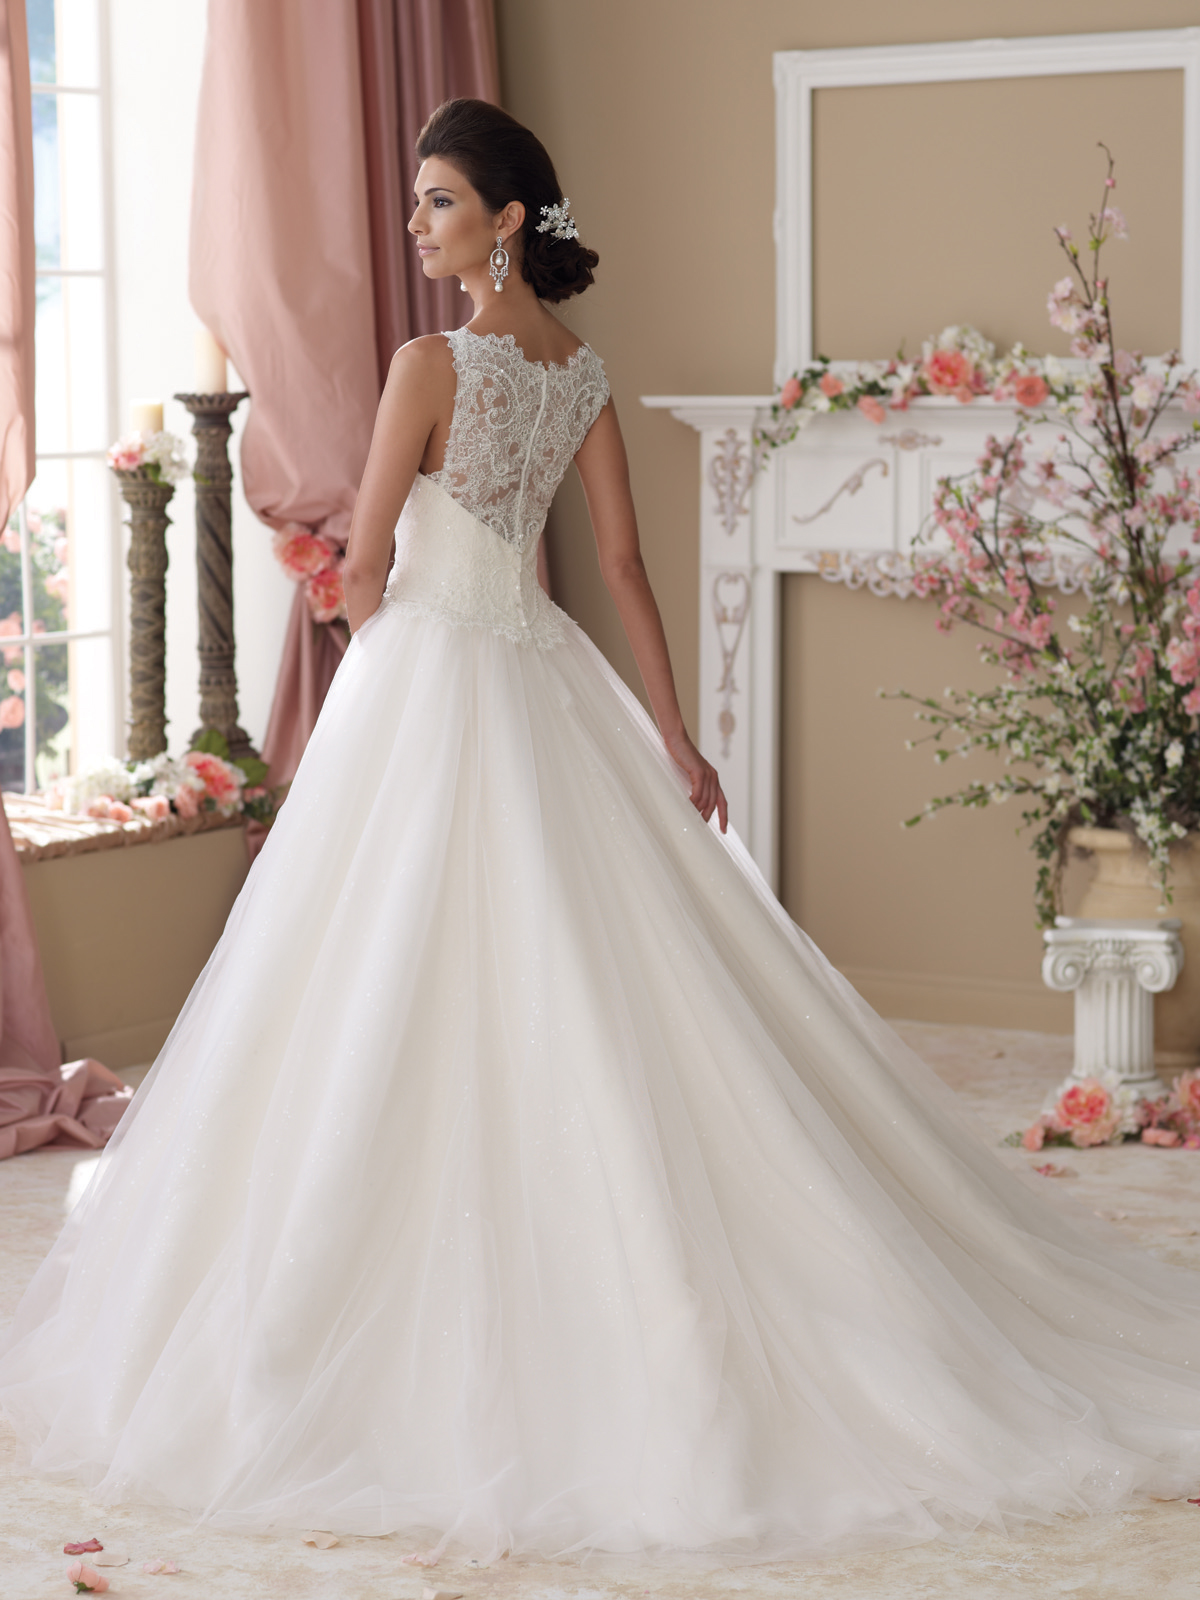 Isobel 114273 fiona todhunter bridals dublin for T back wedding dress